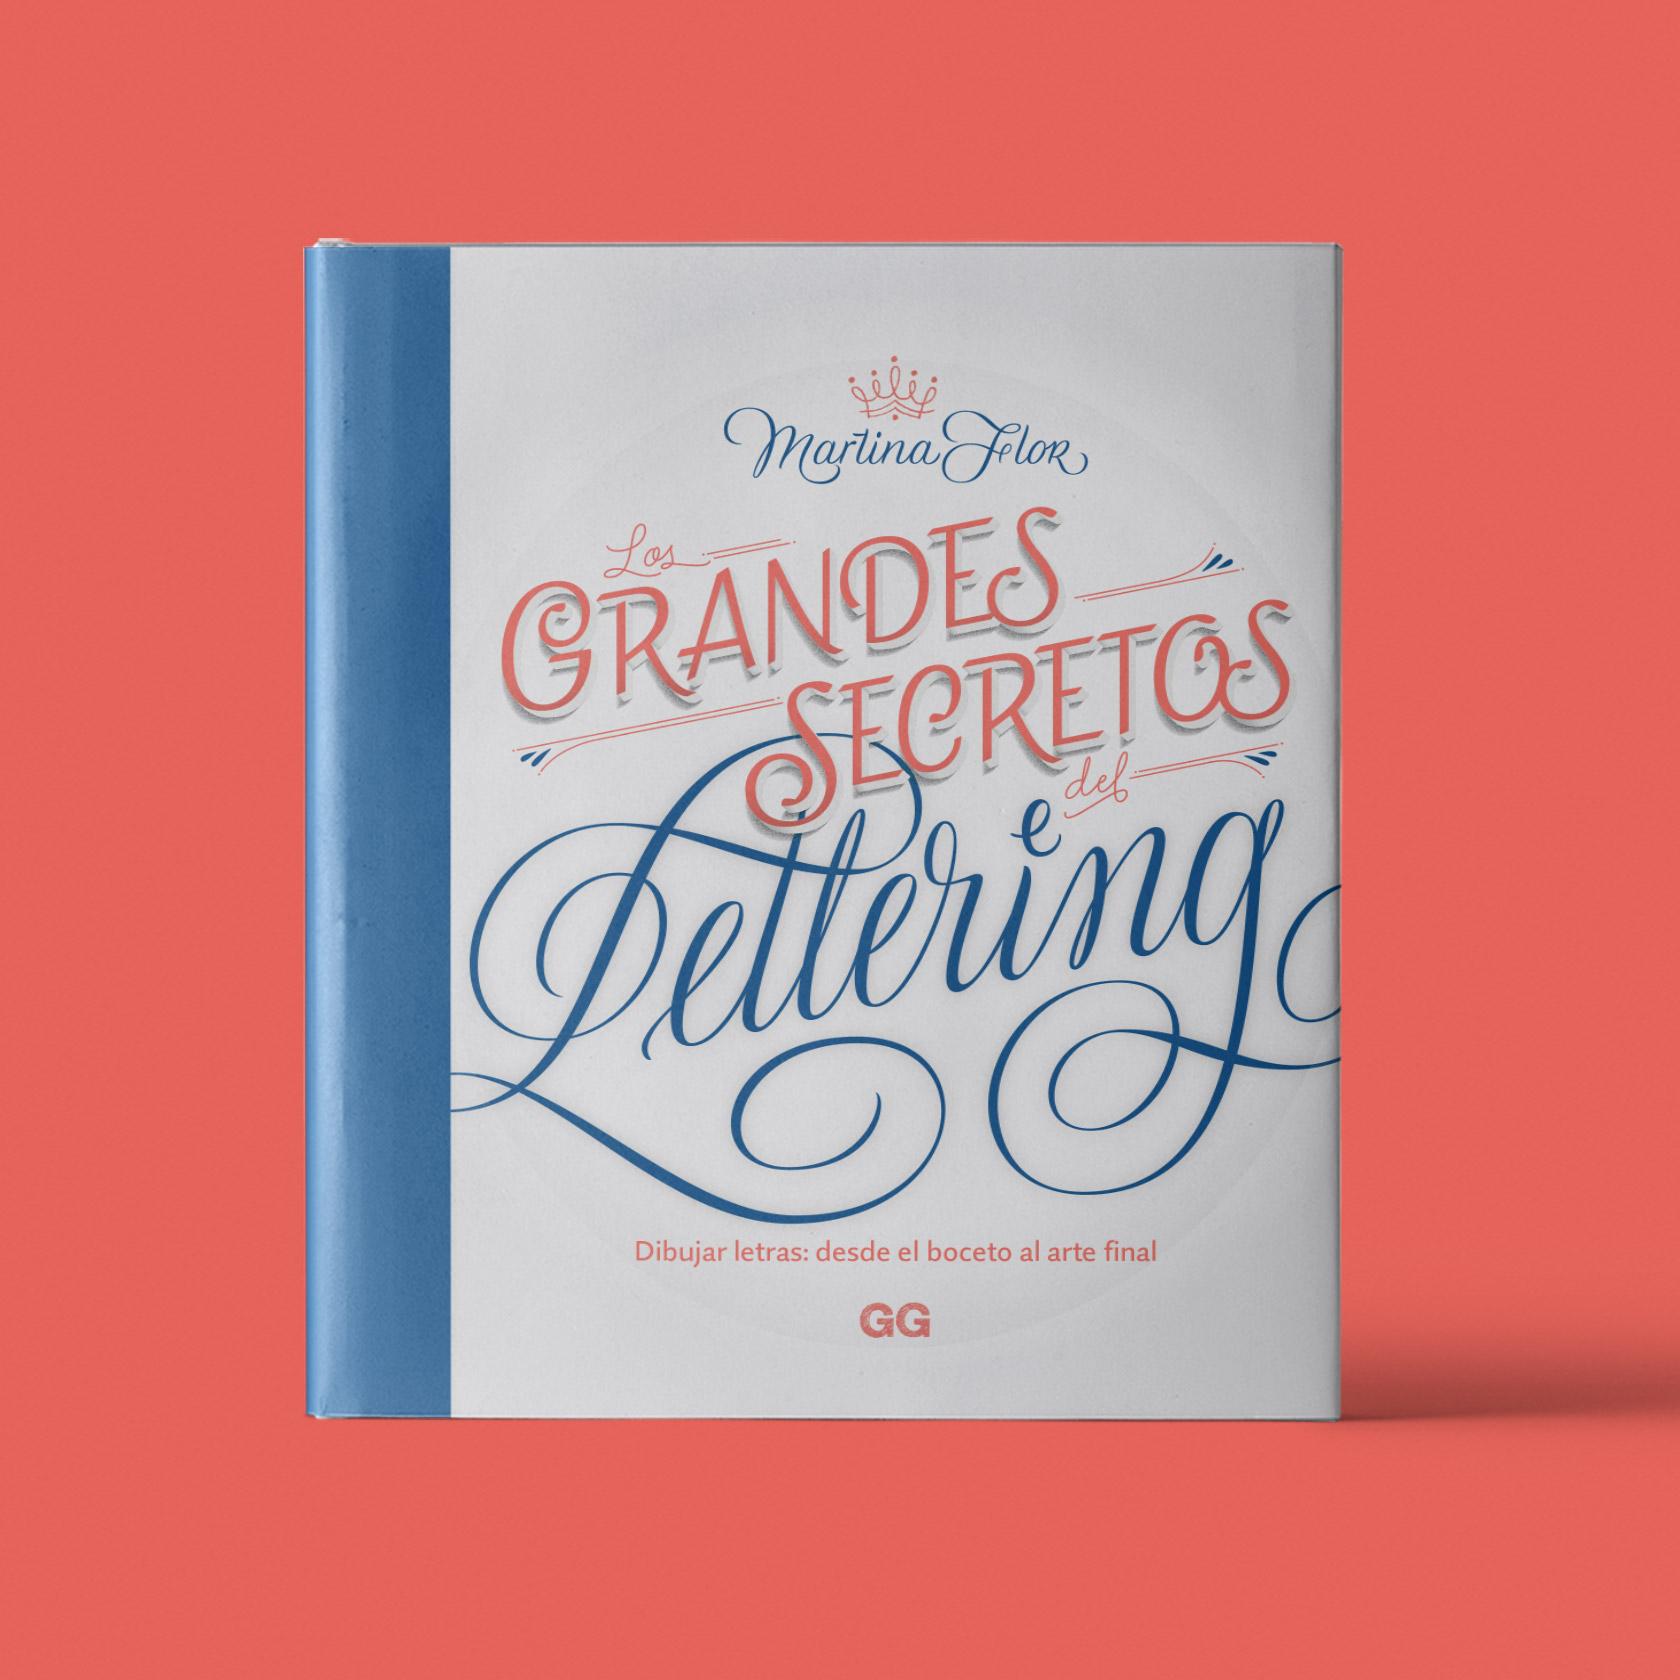 Grandes Secretos del Lettering €24,90